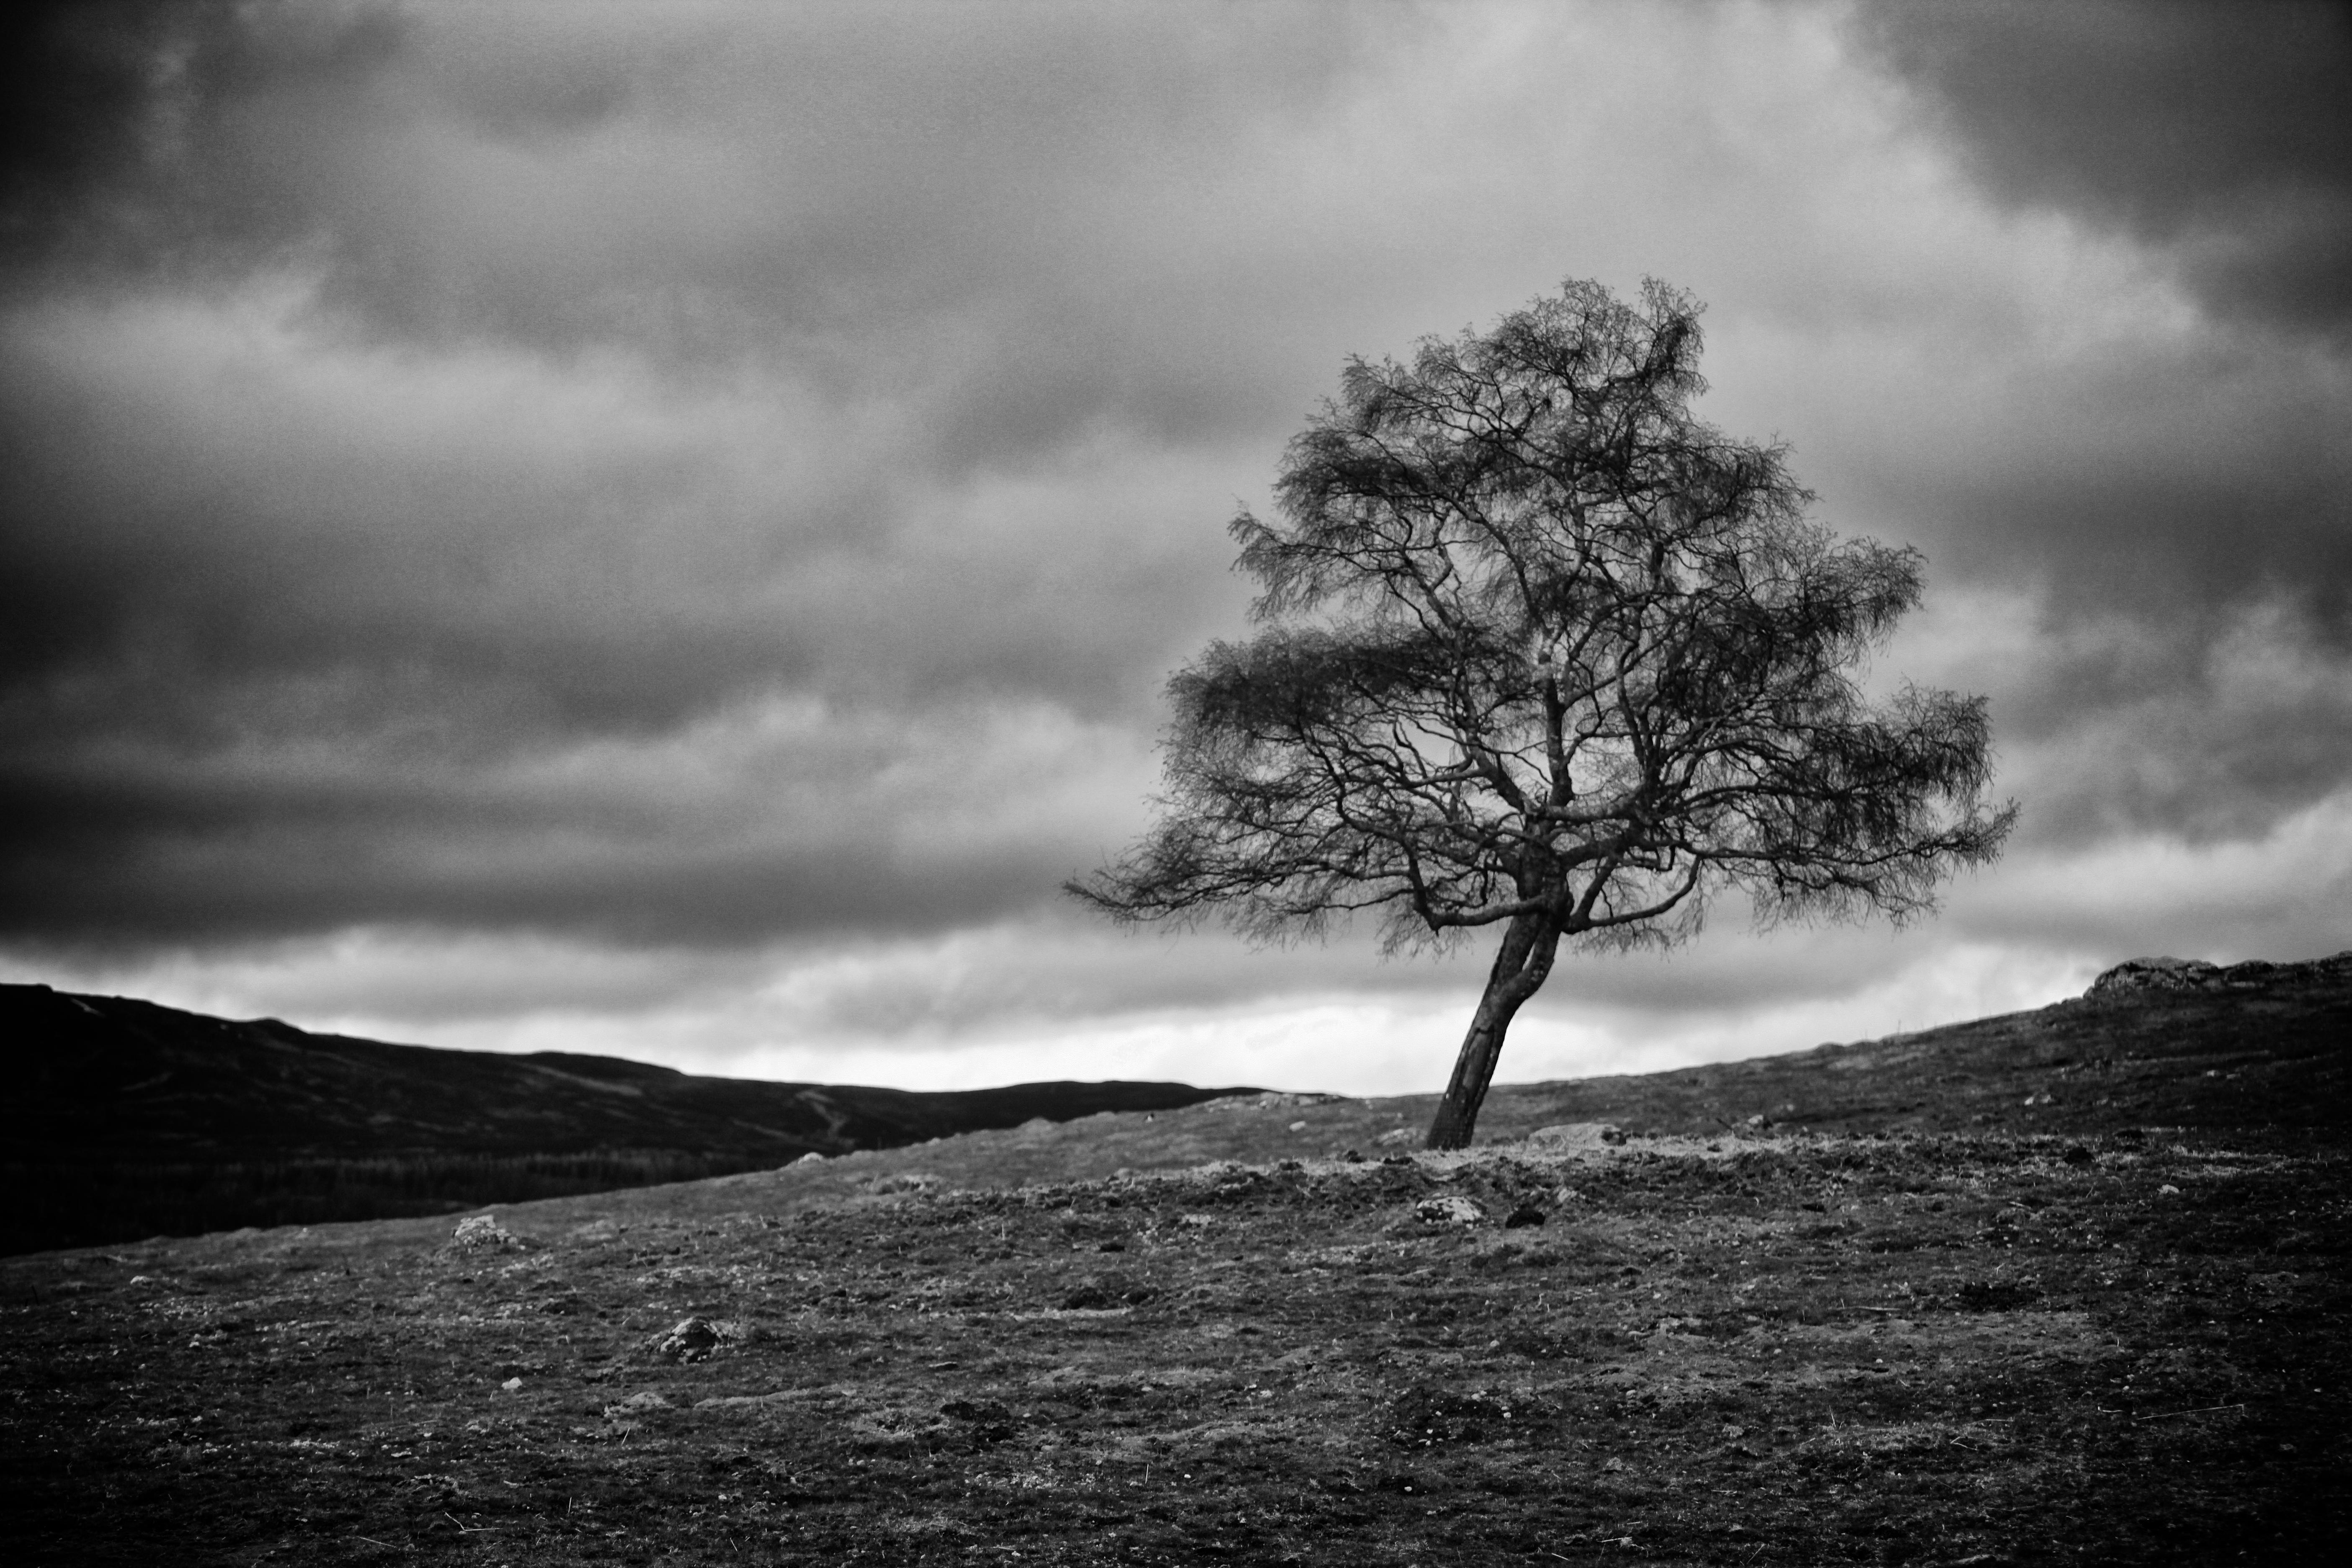 lone_tree_bw